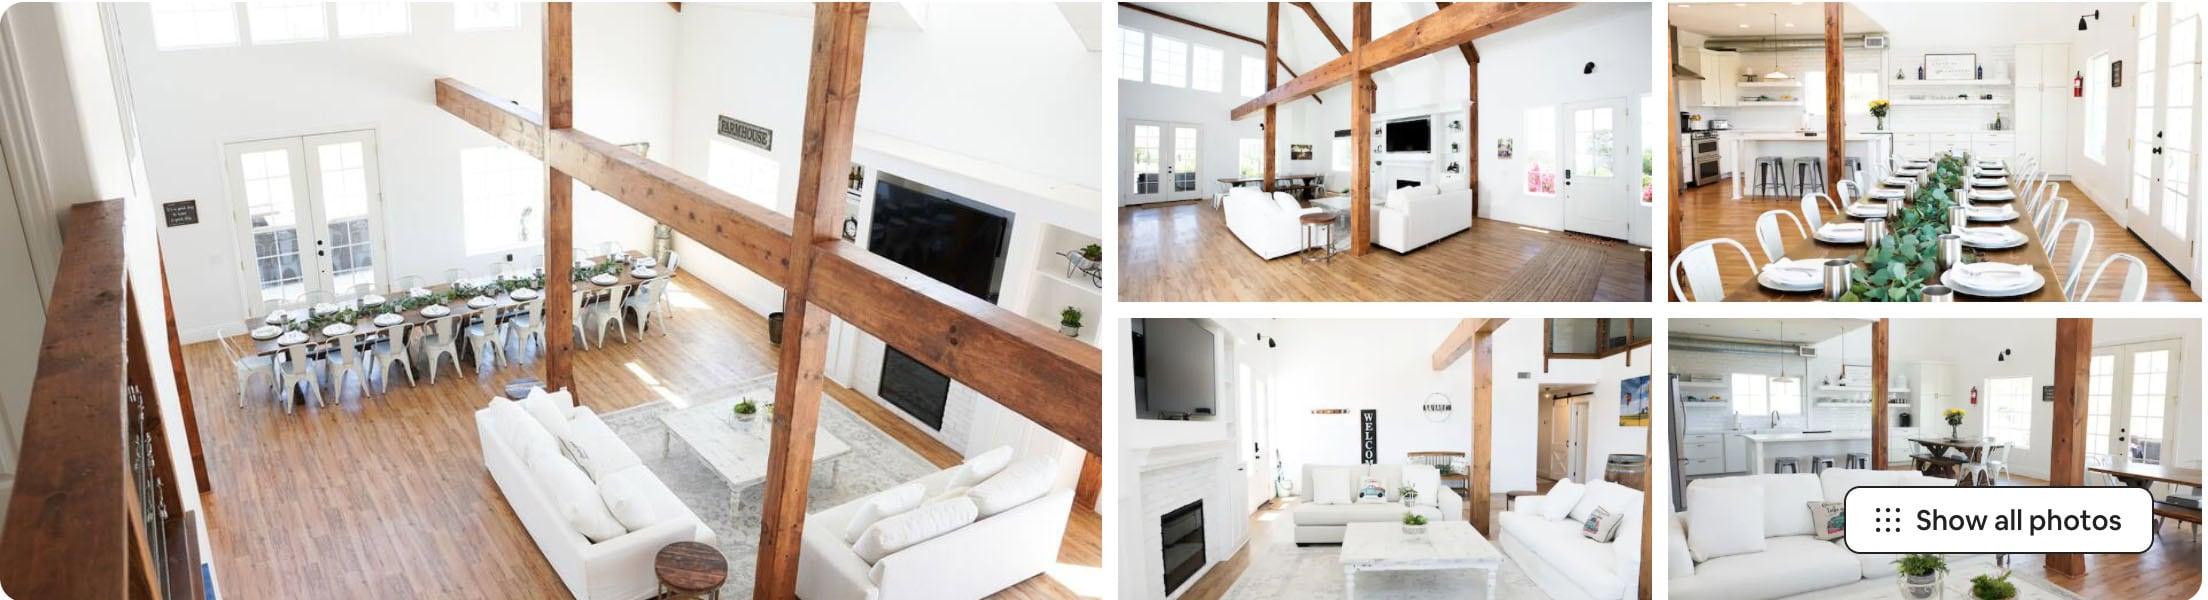 Temecula Airbnb wedding venue in southern california